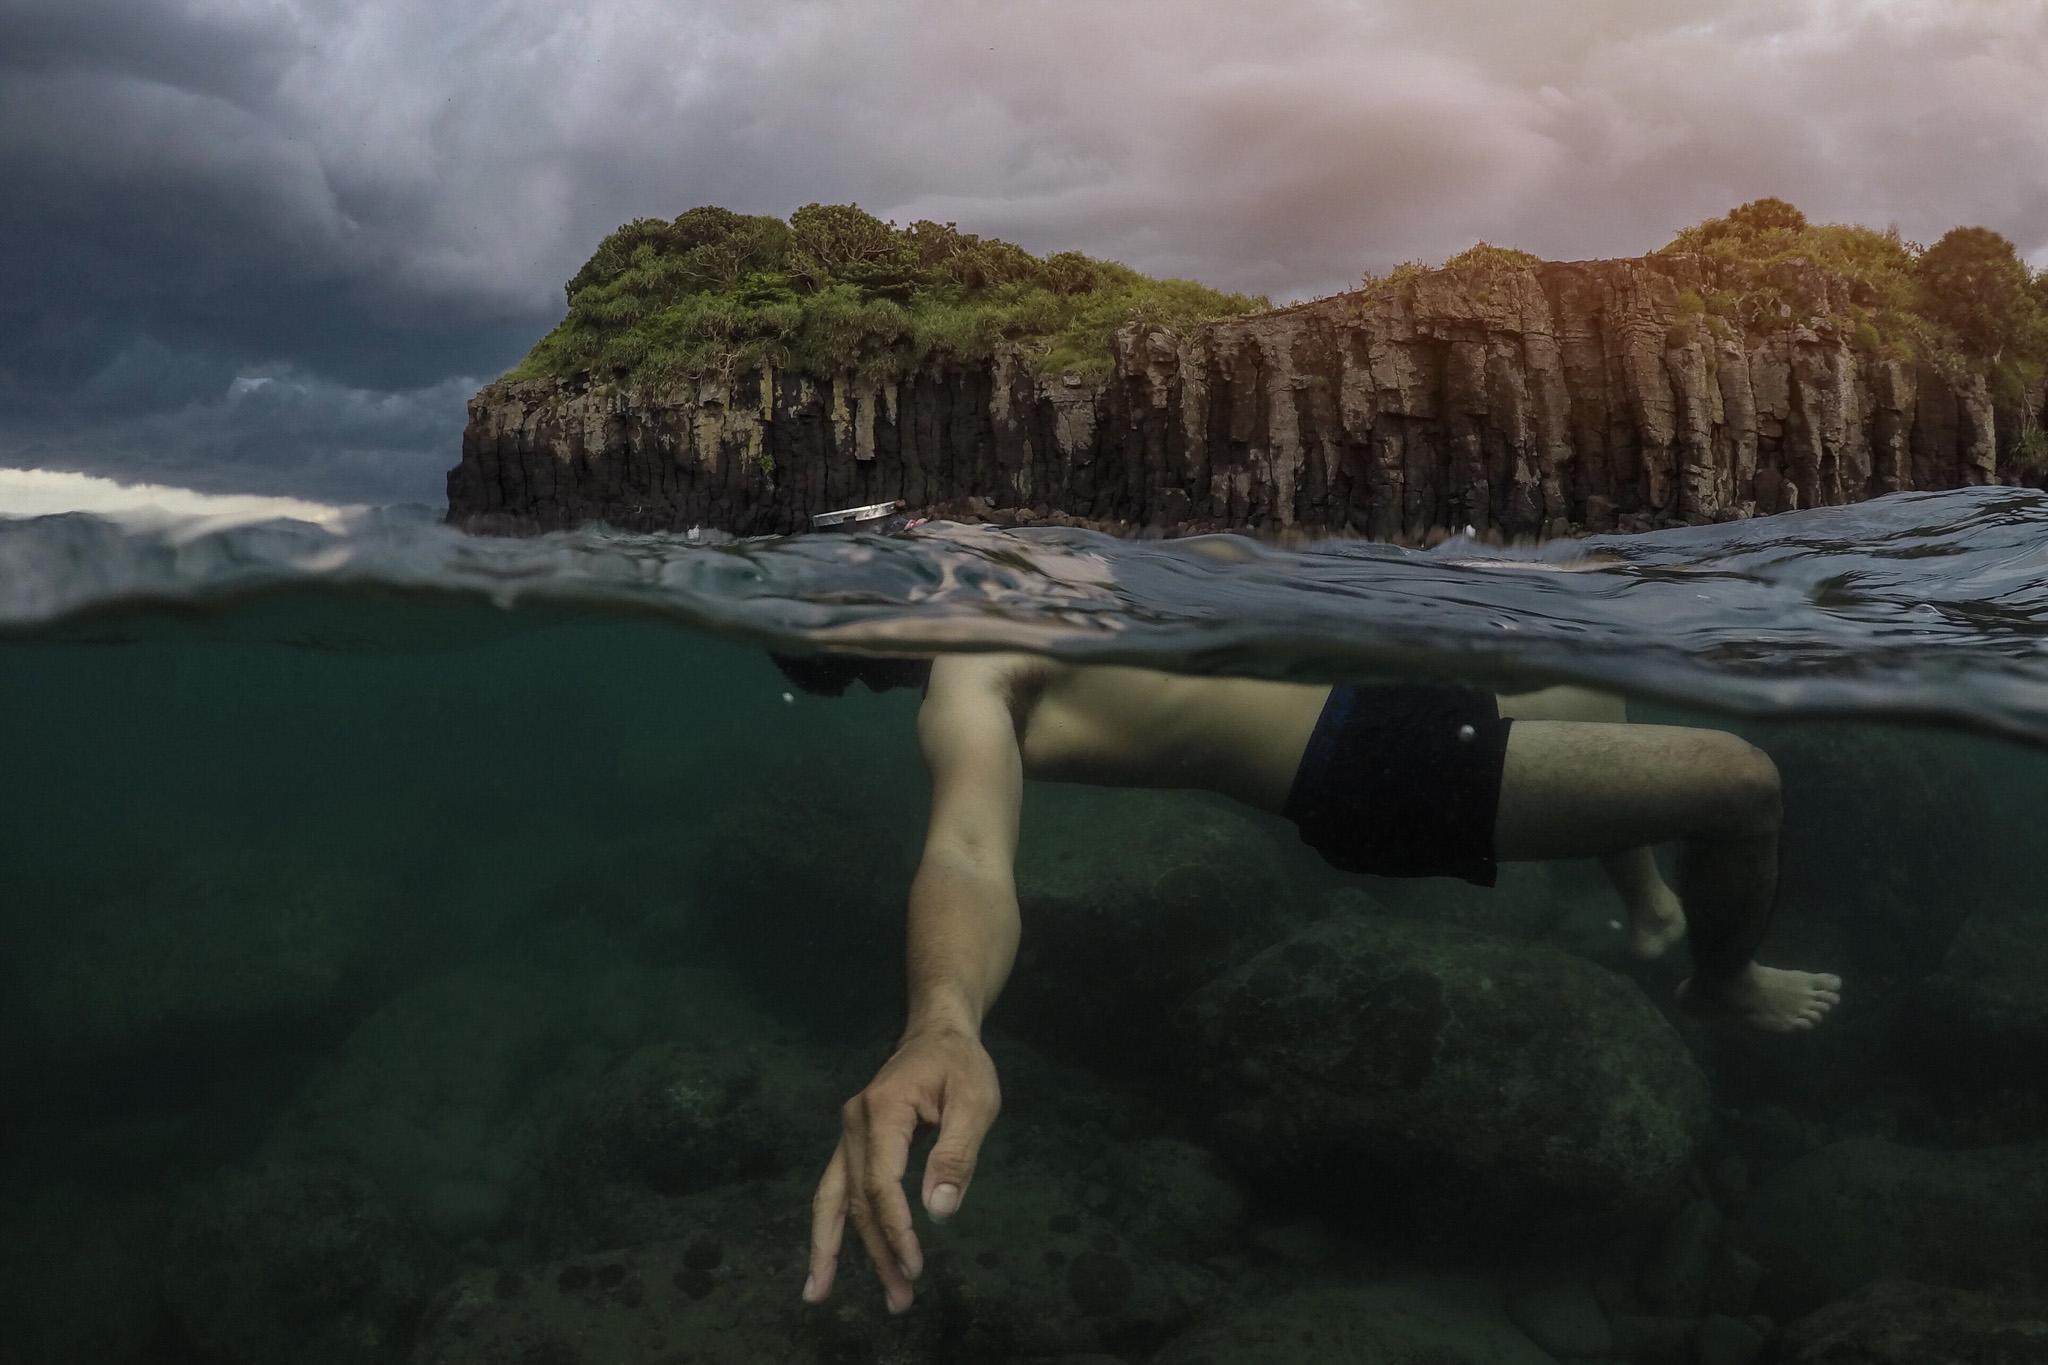 Over Under Water Photos